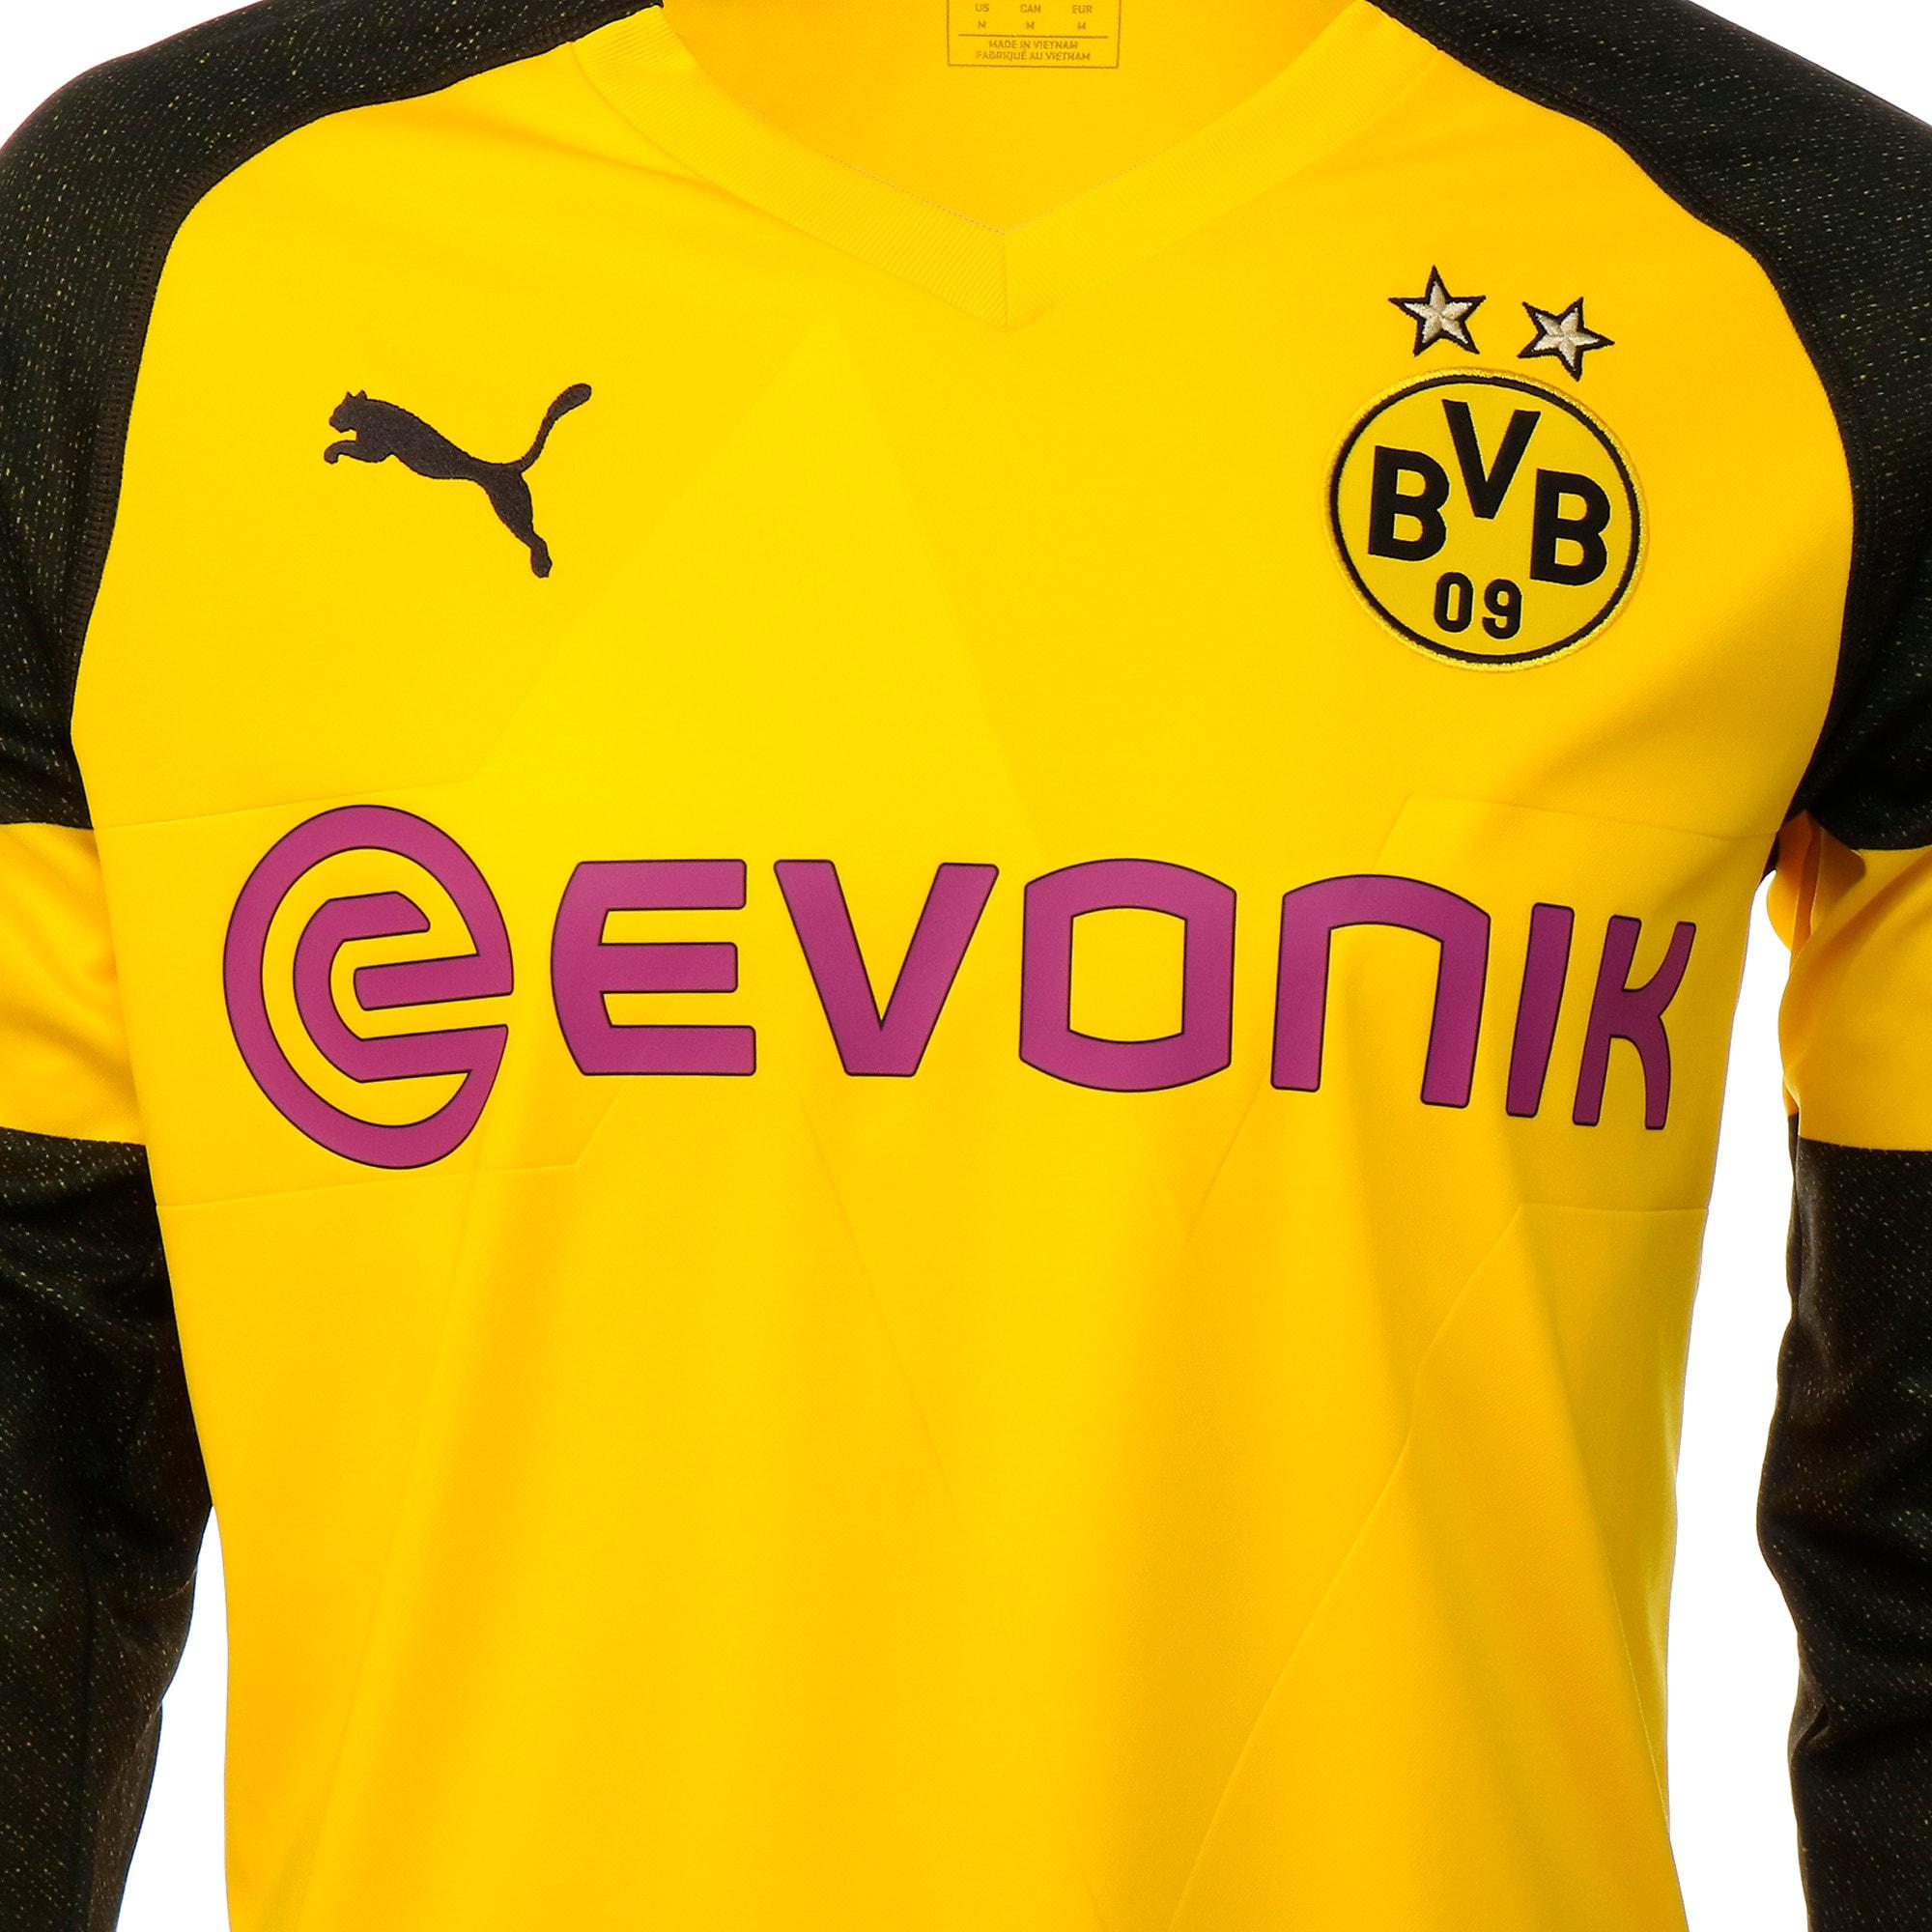 Thumbnail 7 of BVB LS ホーム レプリカシャツ, Cyber Yellow, medium-JPN